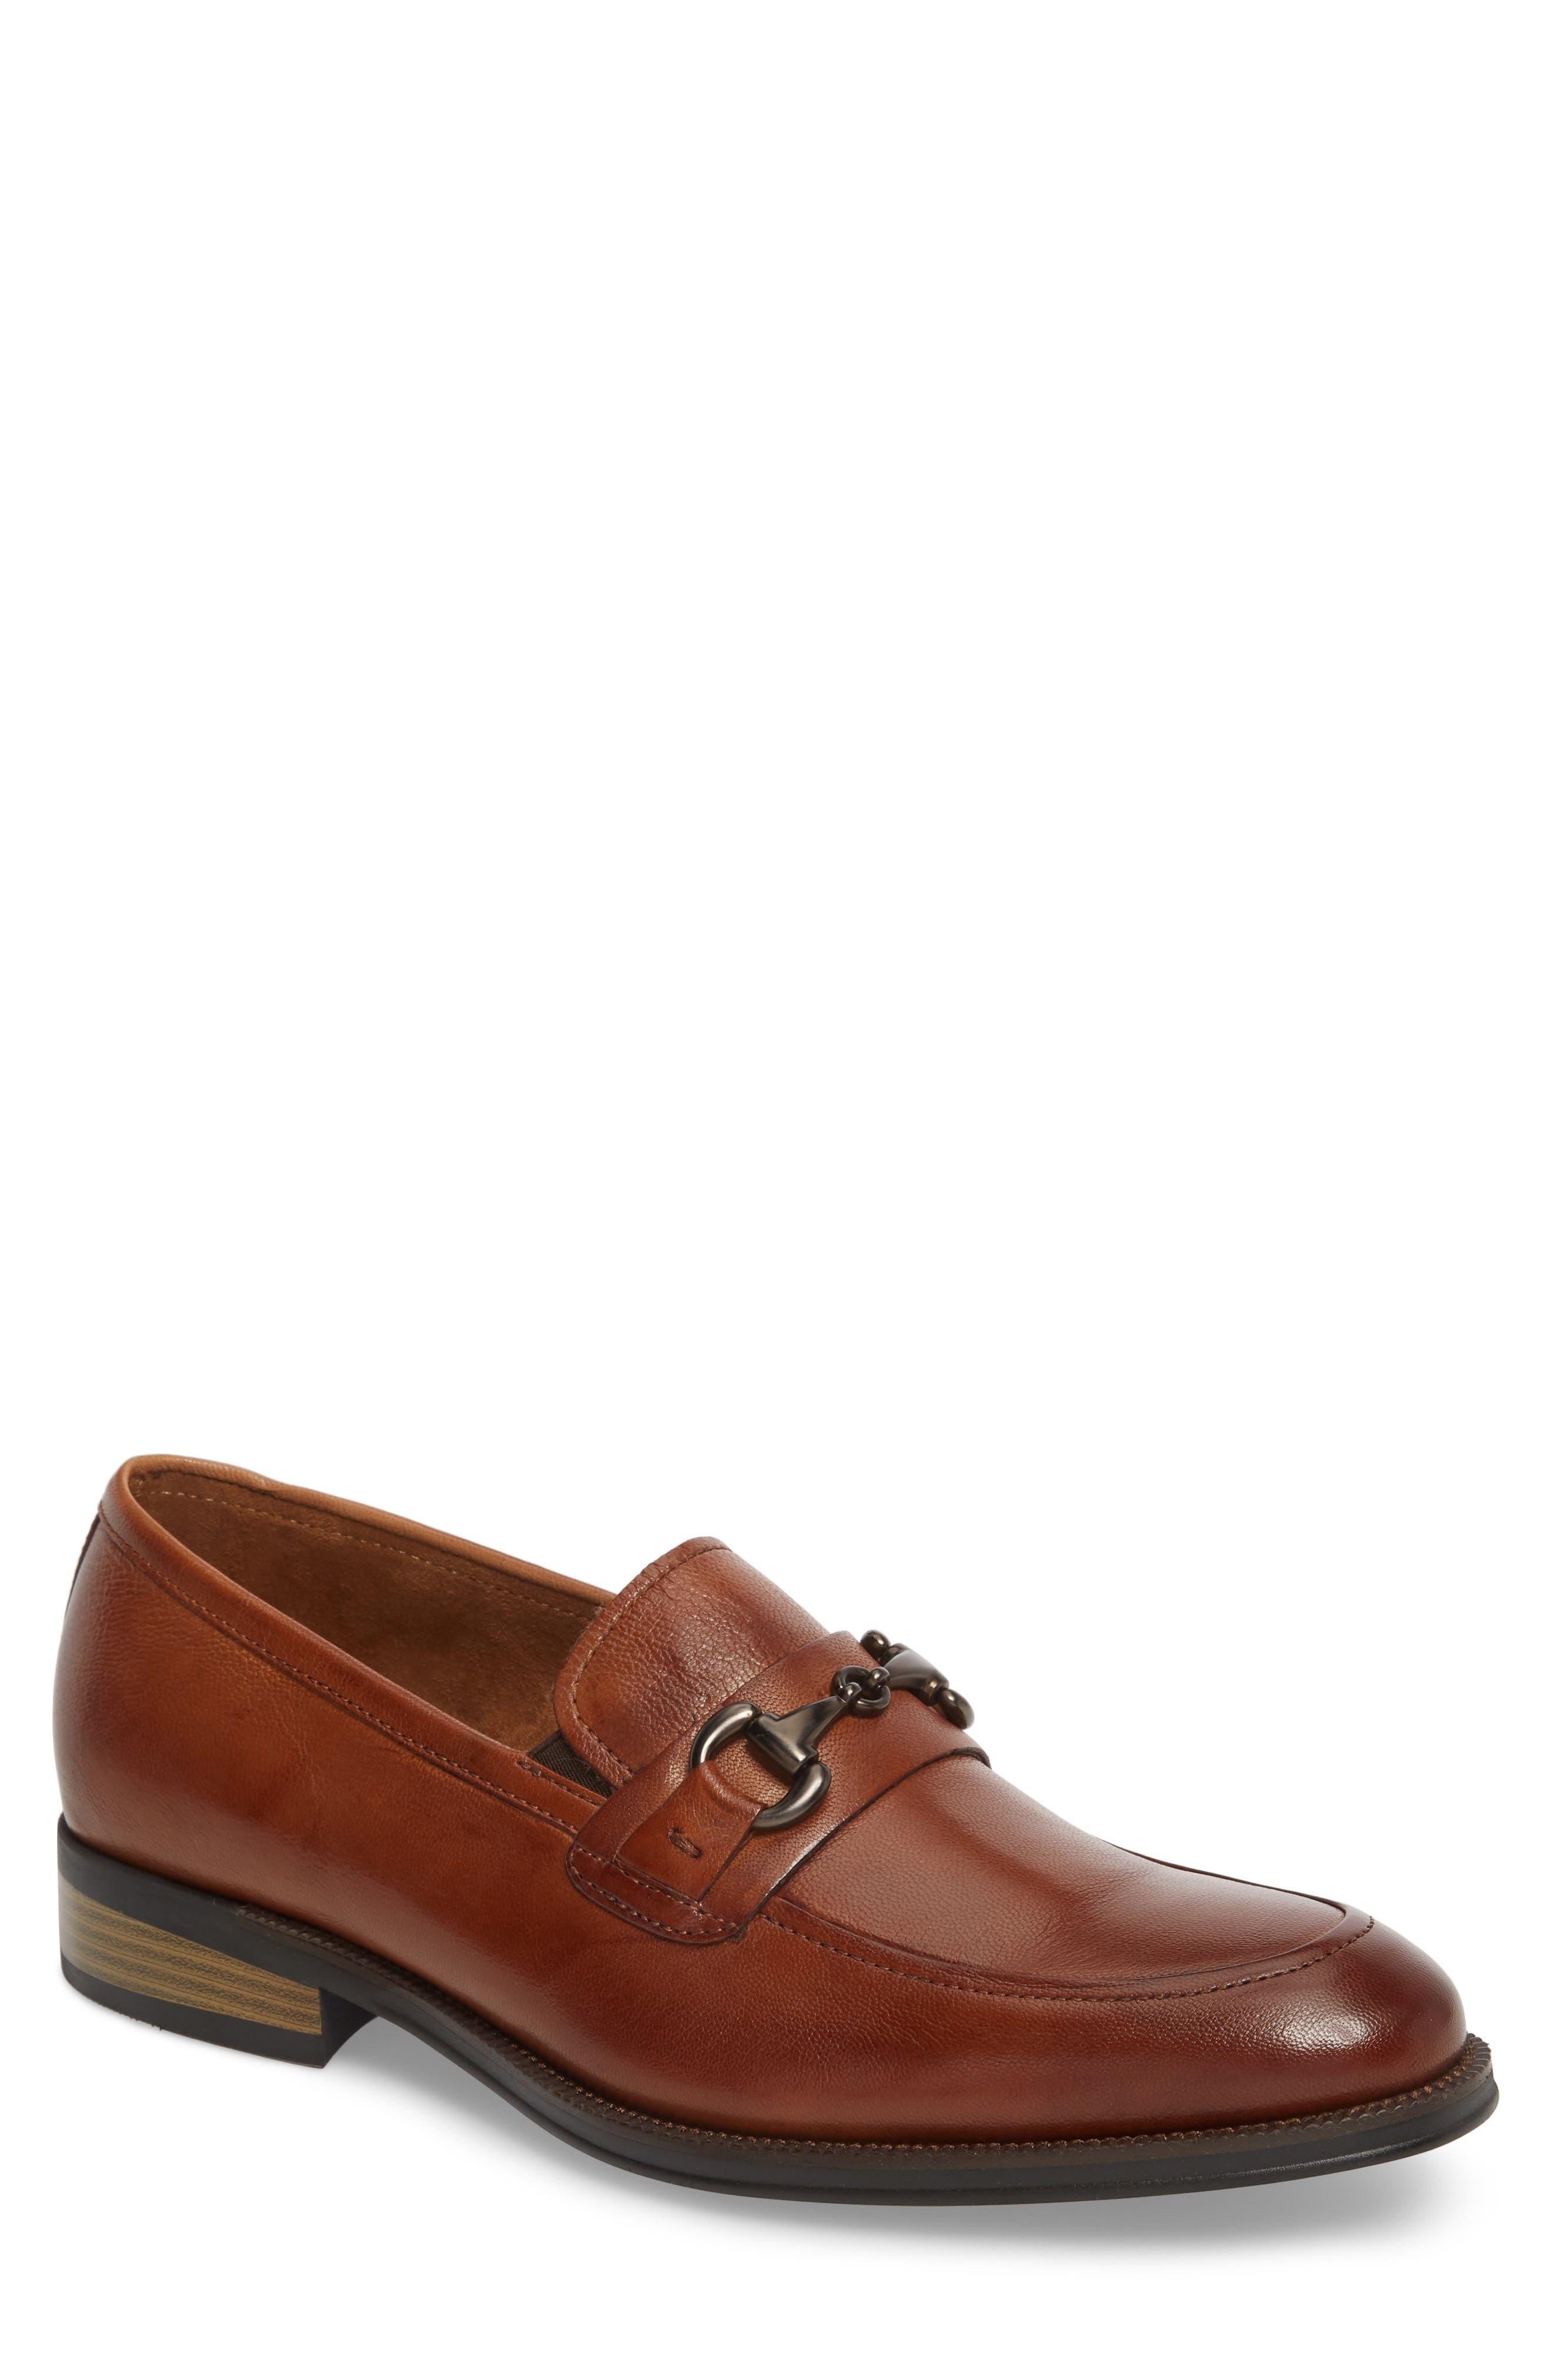 Brock Bit Loafer,                         Main,                         color, Cognac Leather